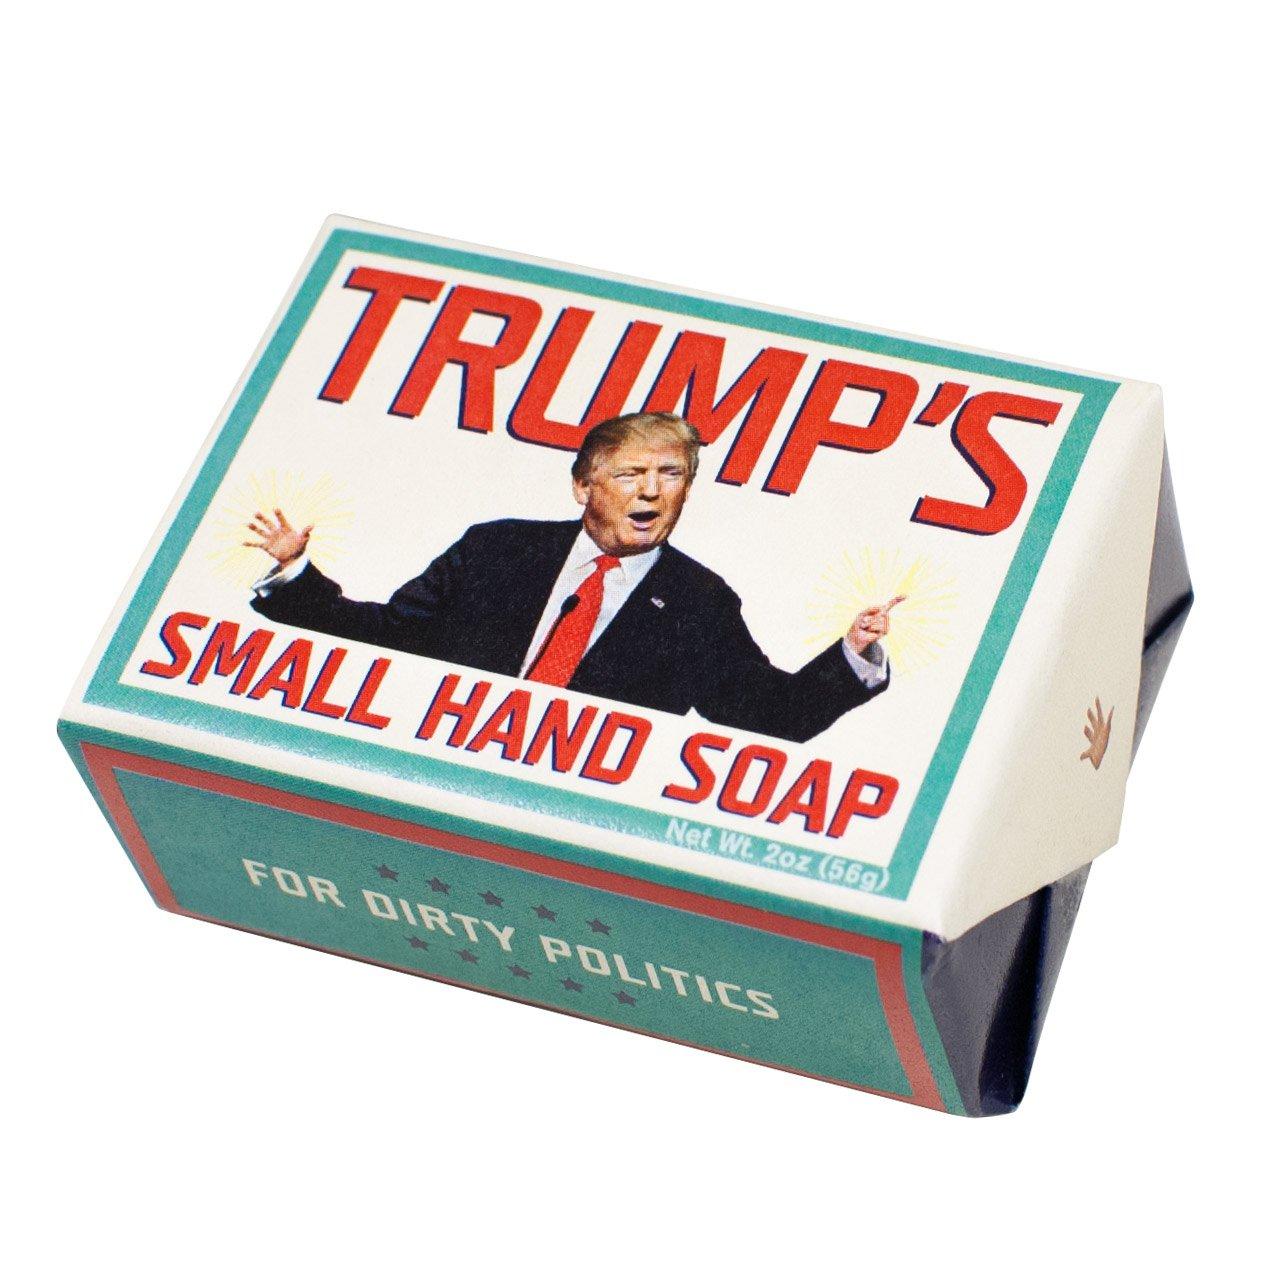 Made in The USA Freud Wash Fulfillment Soap 1 Mini Bar of Soap